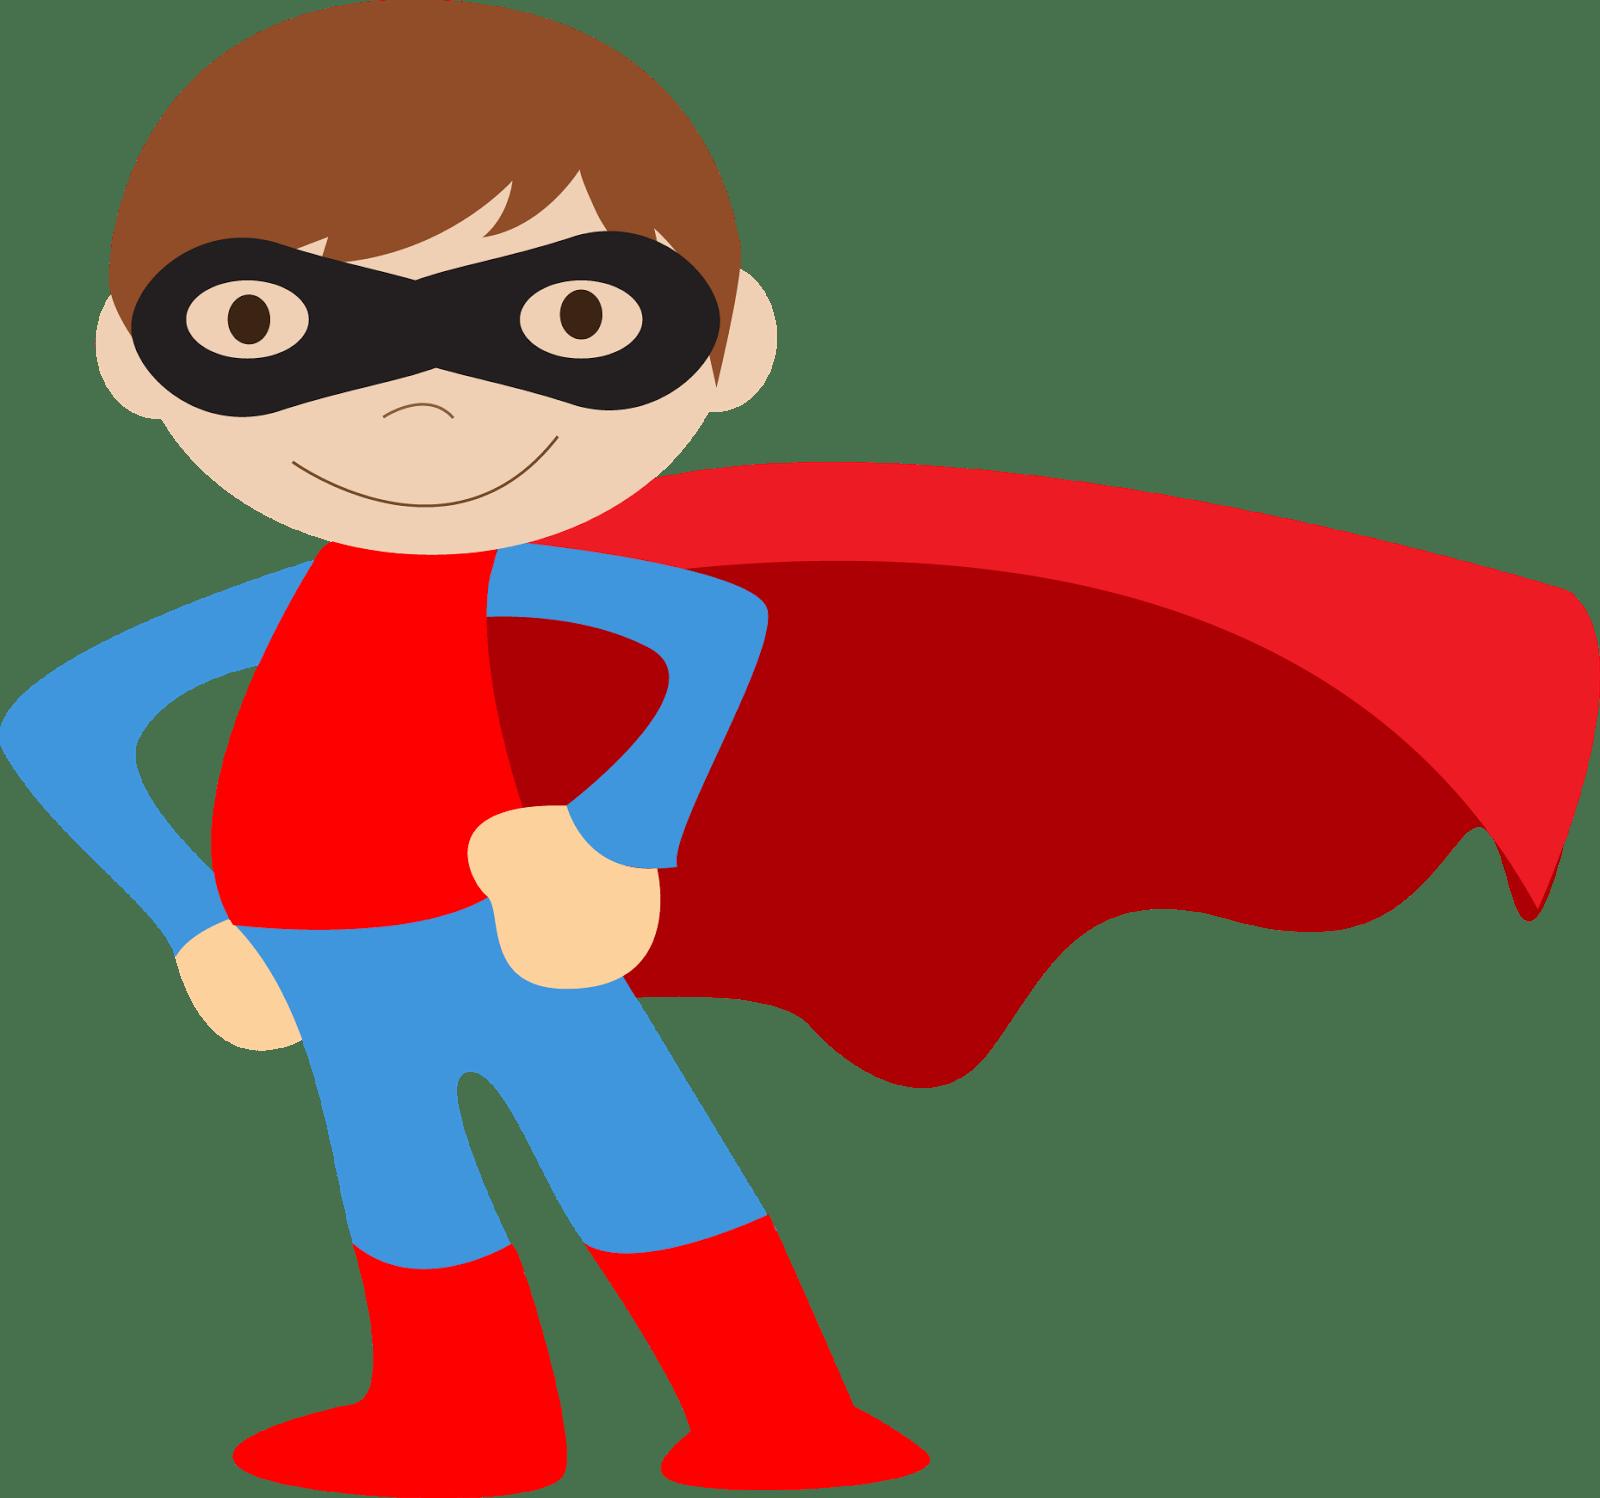 Clipart Boy Superhero Clipart Boy Superhero Transparent